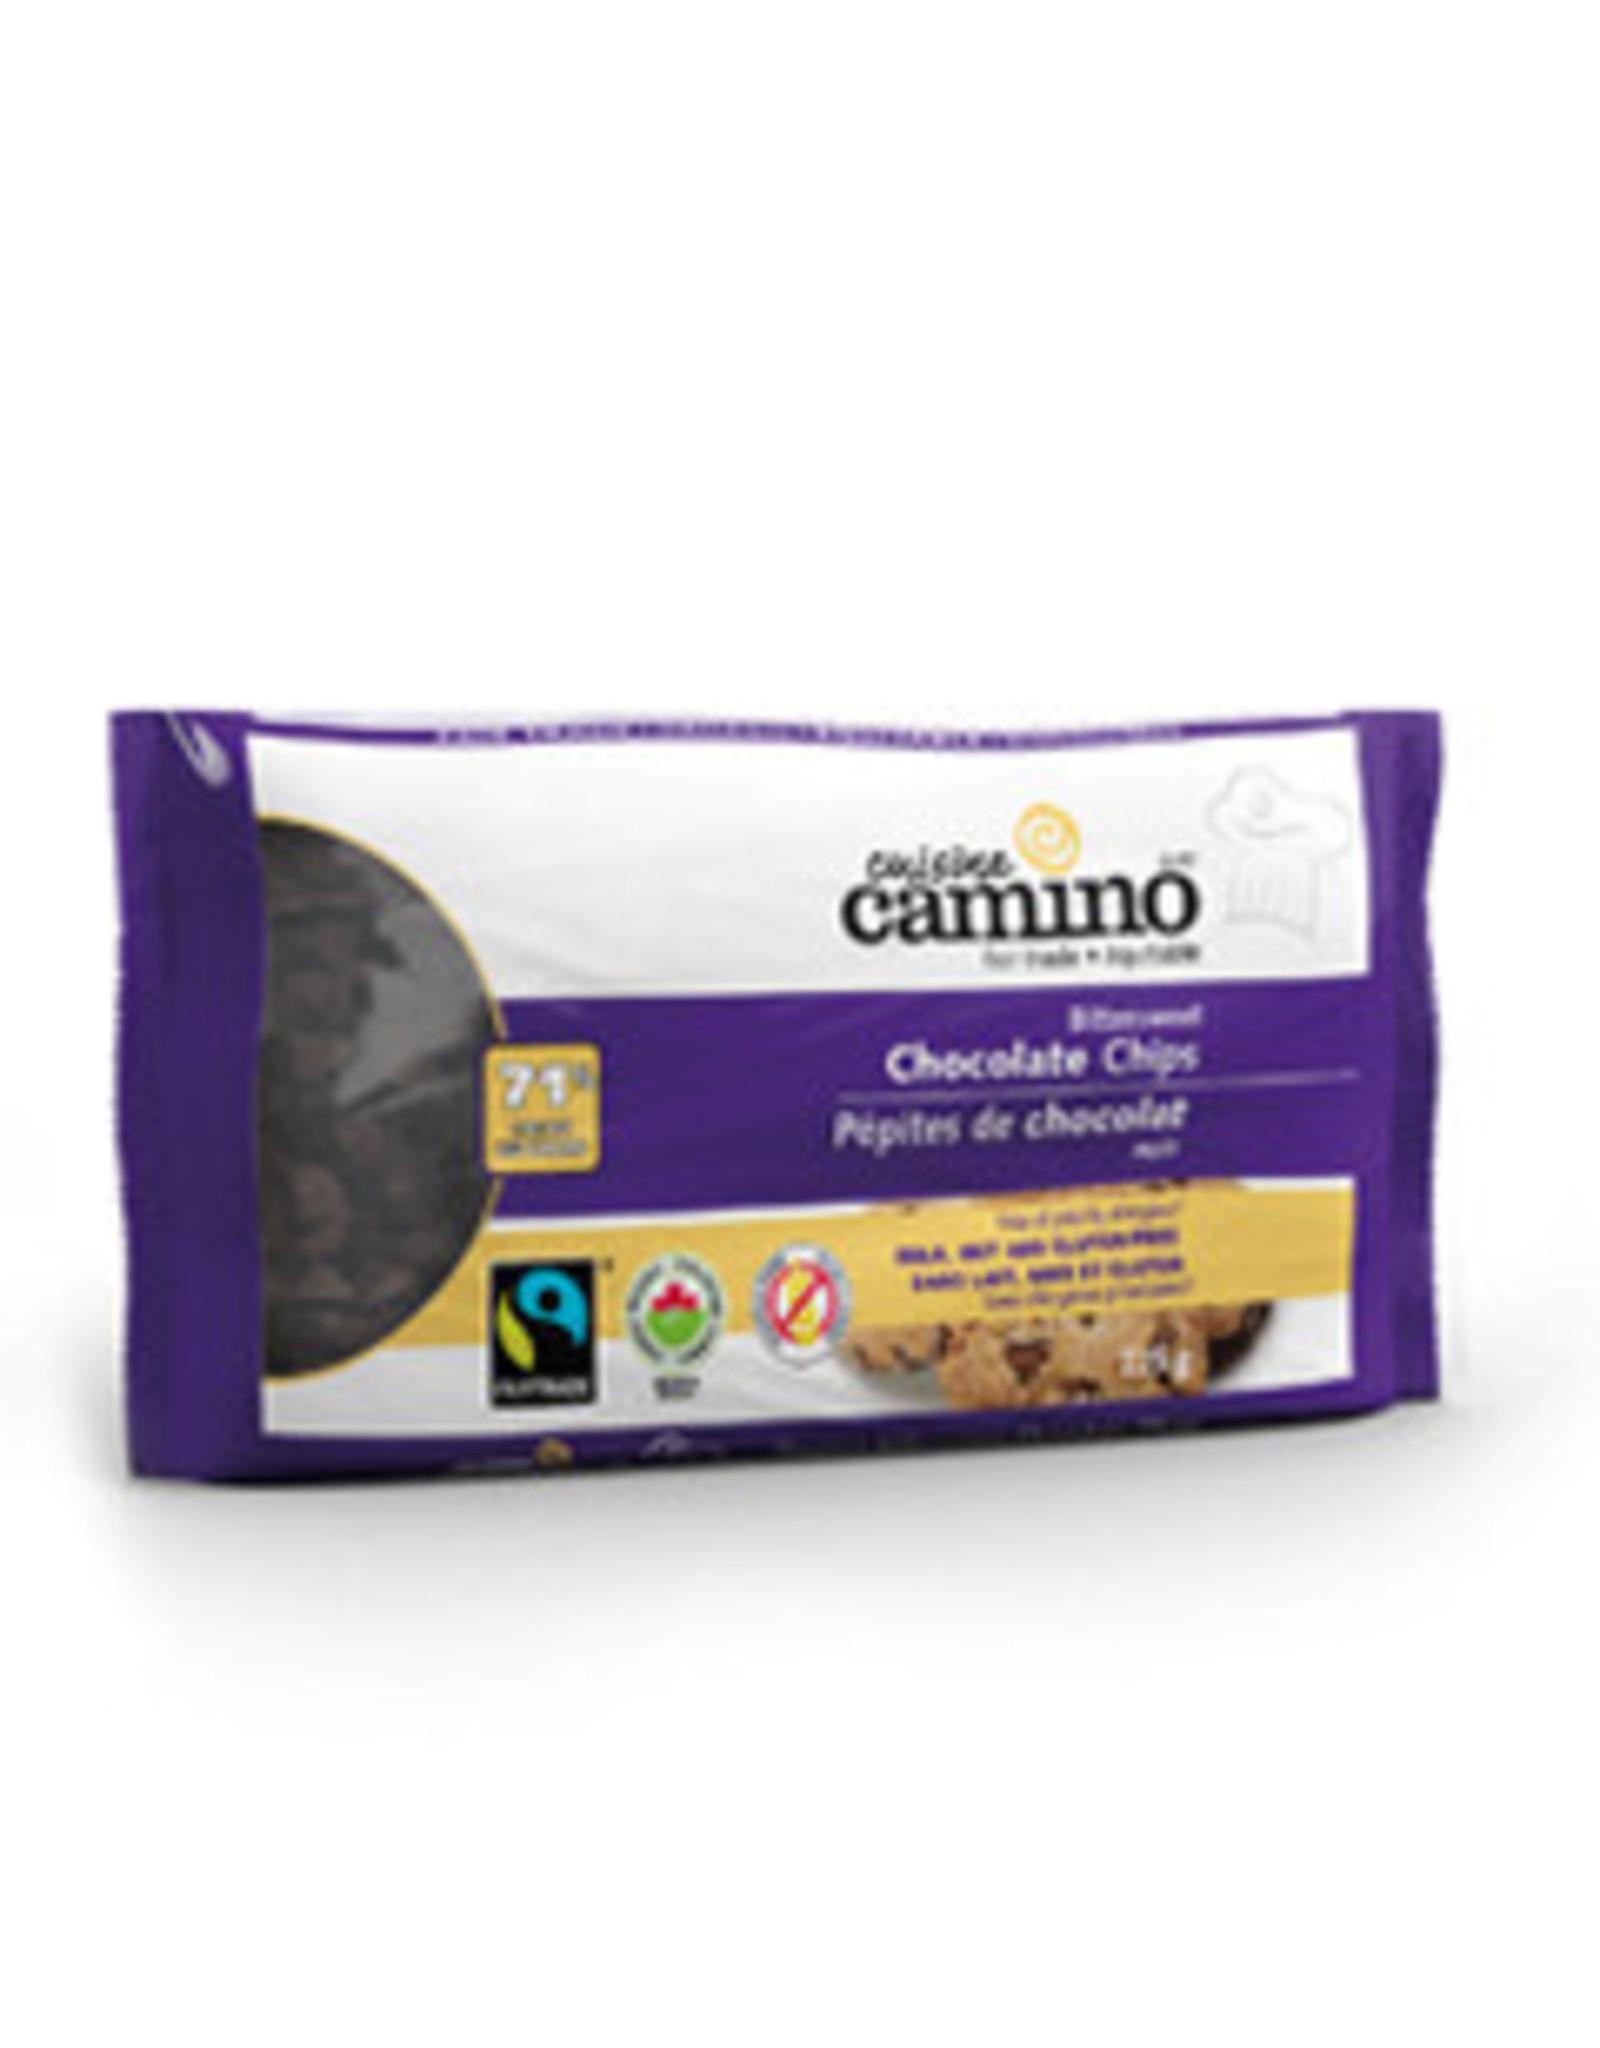 Camino Camino - Baking Chocolate, 71% Cacao Chocolate Chips (225g)